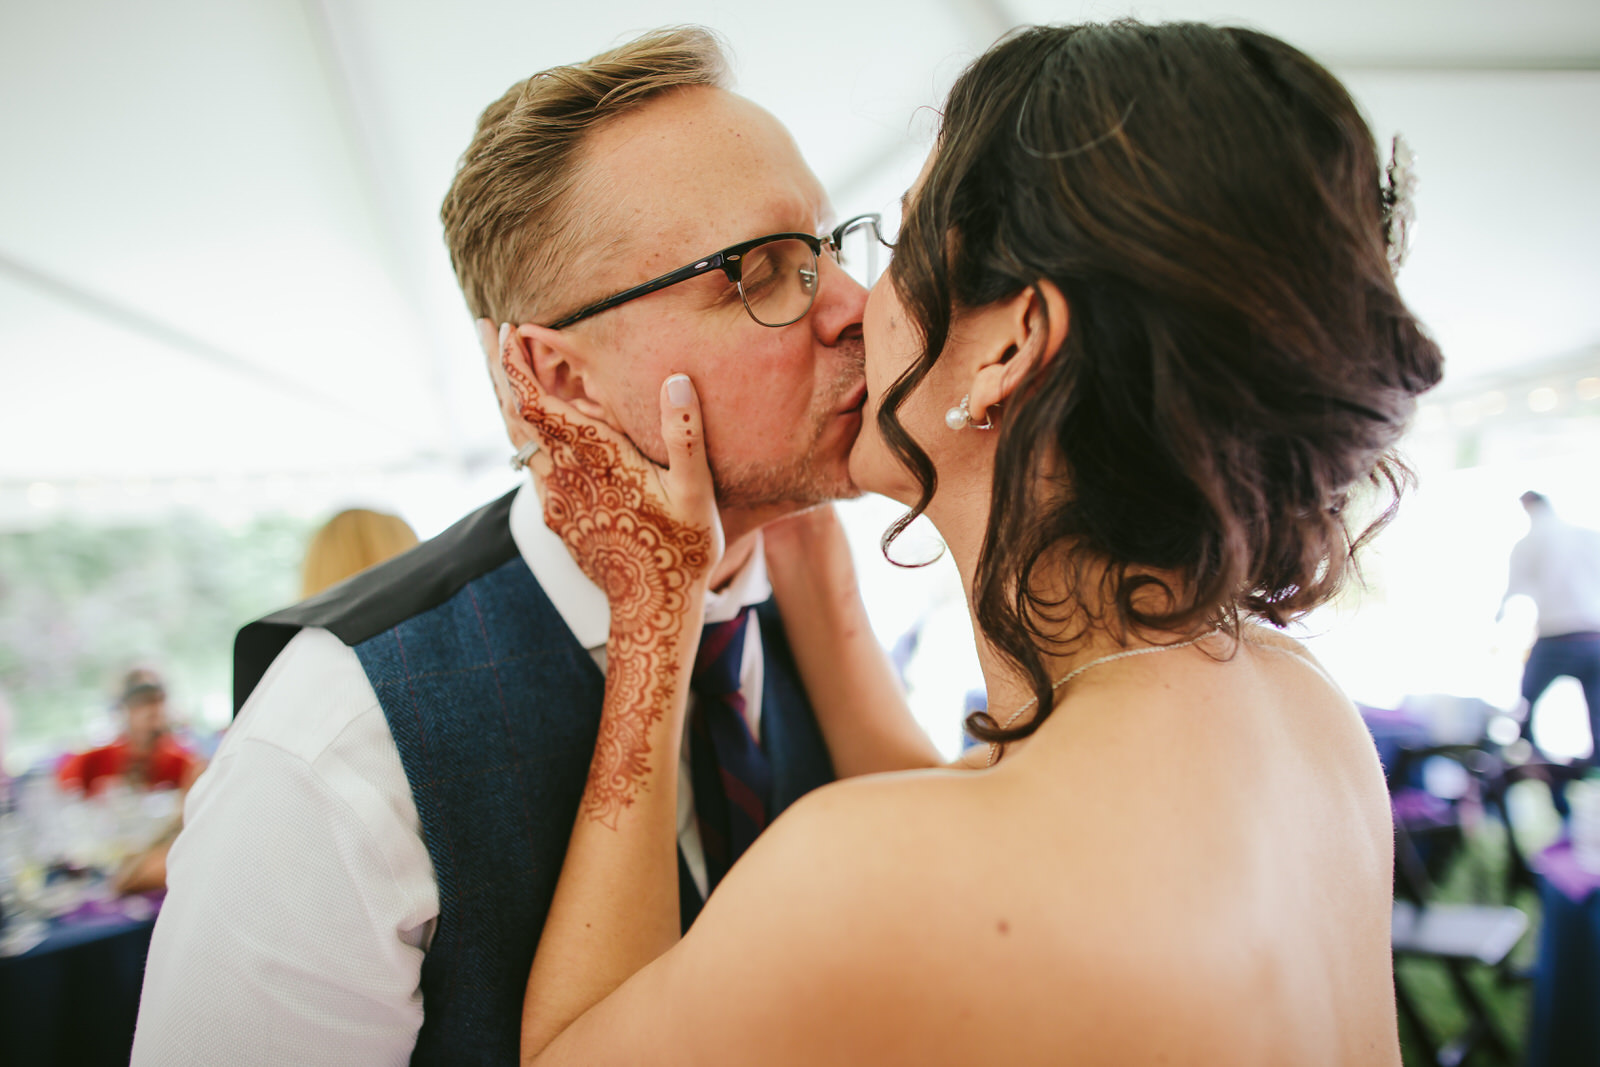 kashi-wedding-reception-tiny-house-photo-bride-groom-kissing.jpg